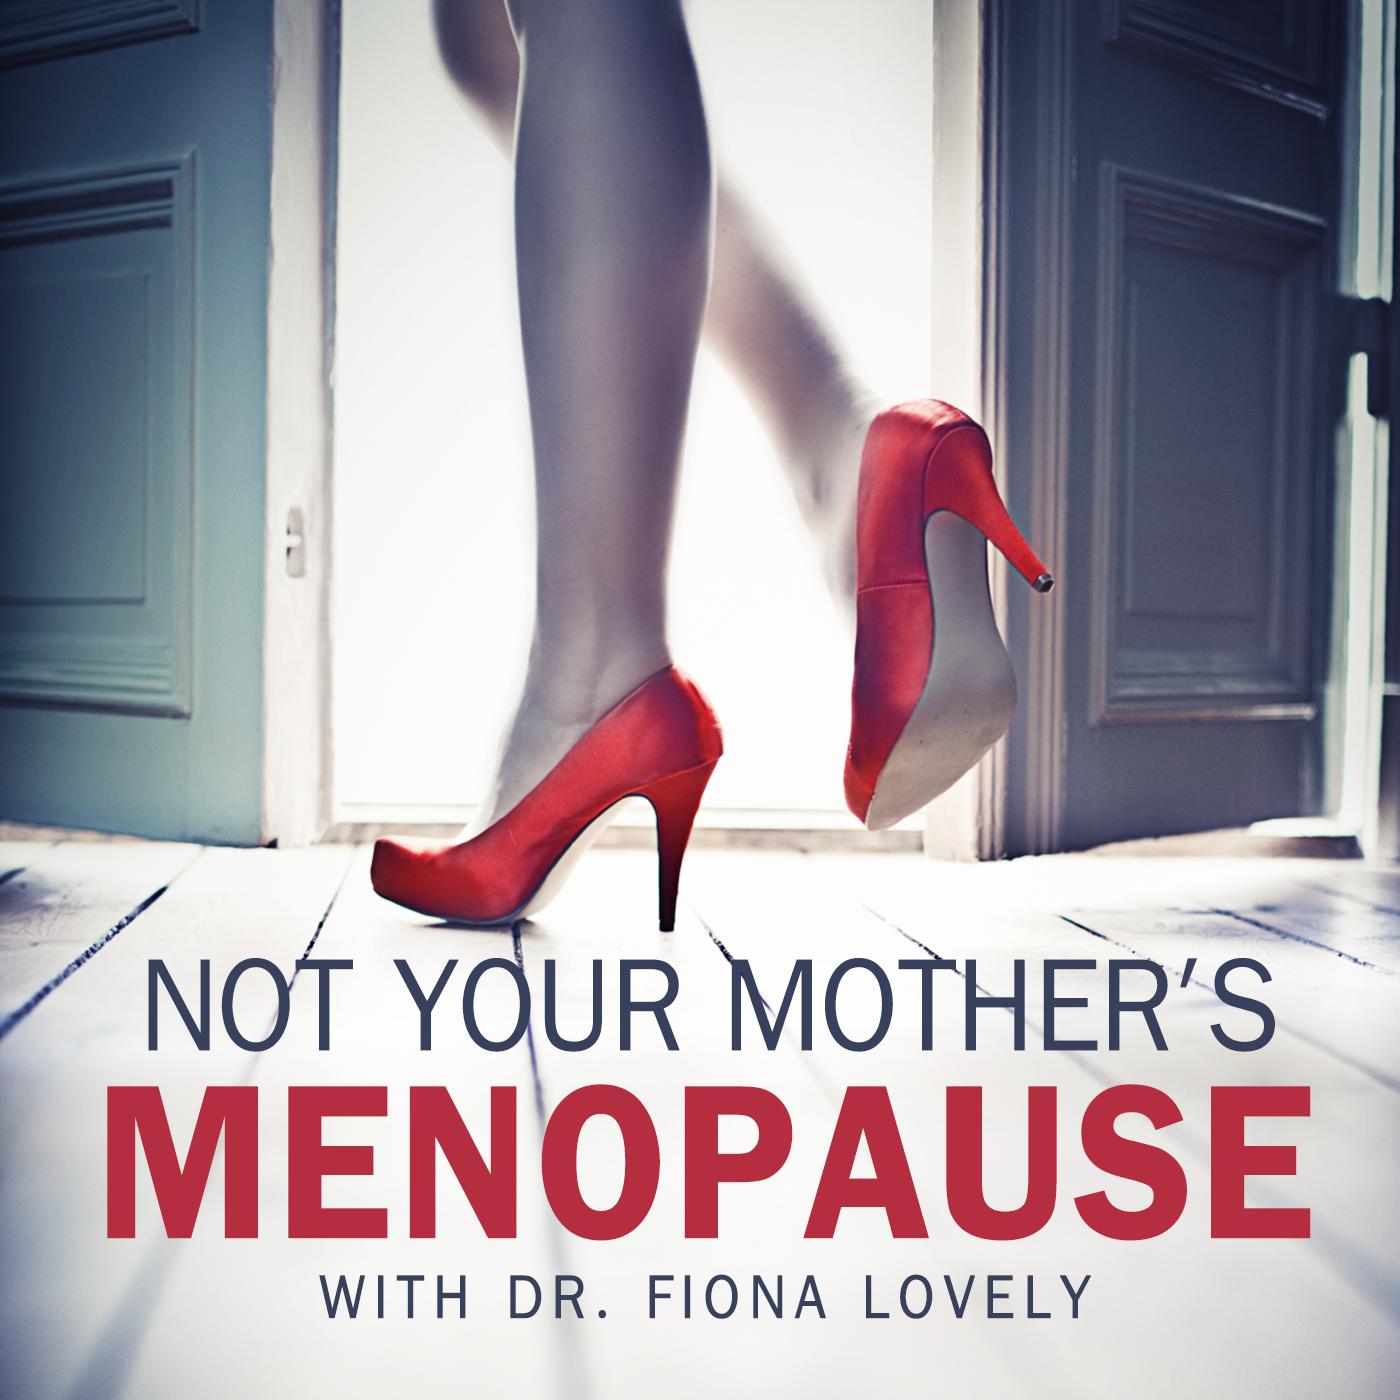 Ep. 070- Pelvic Floor Health with The Vaginacologist, Dr. Teresa Irwin